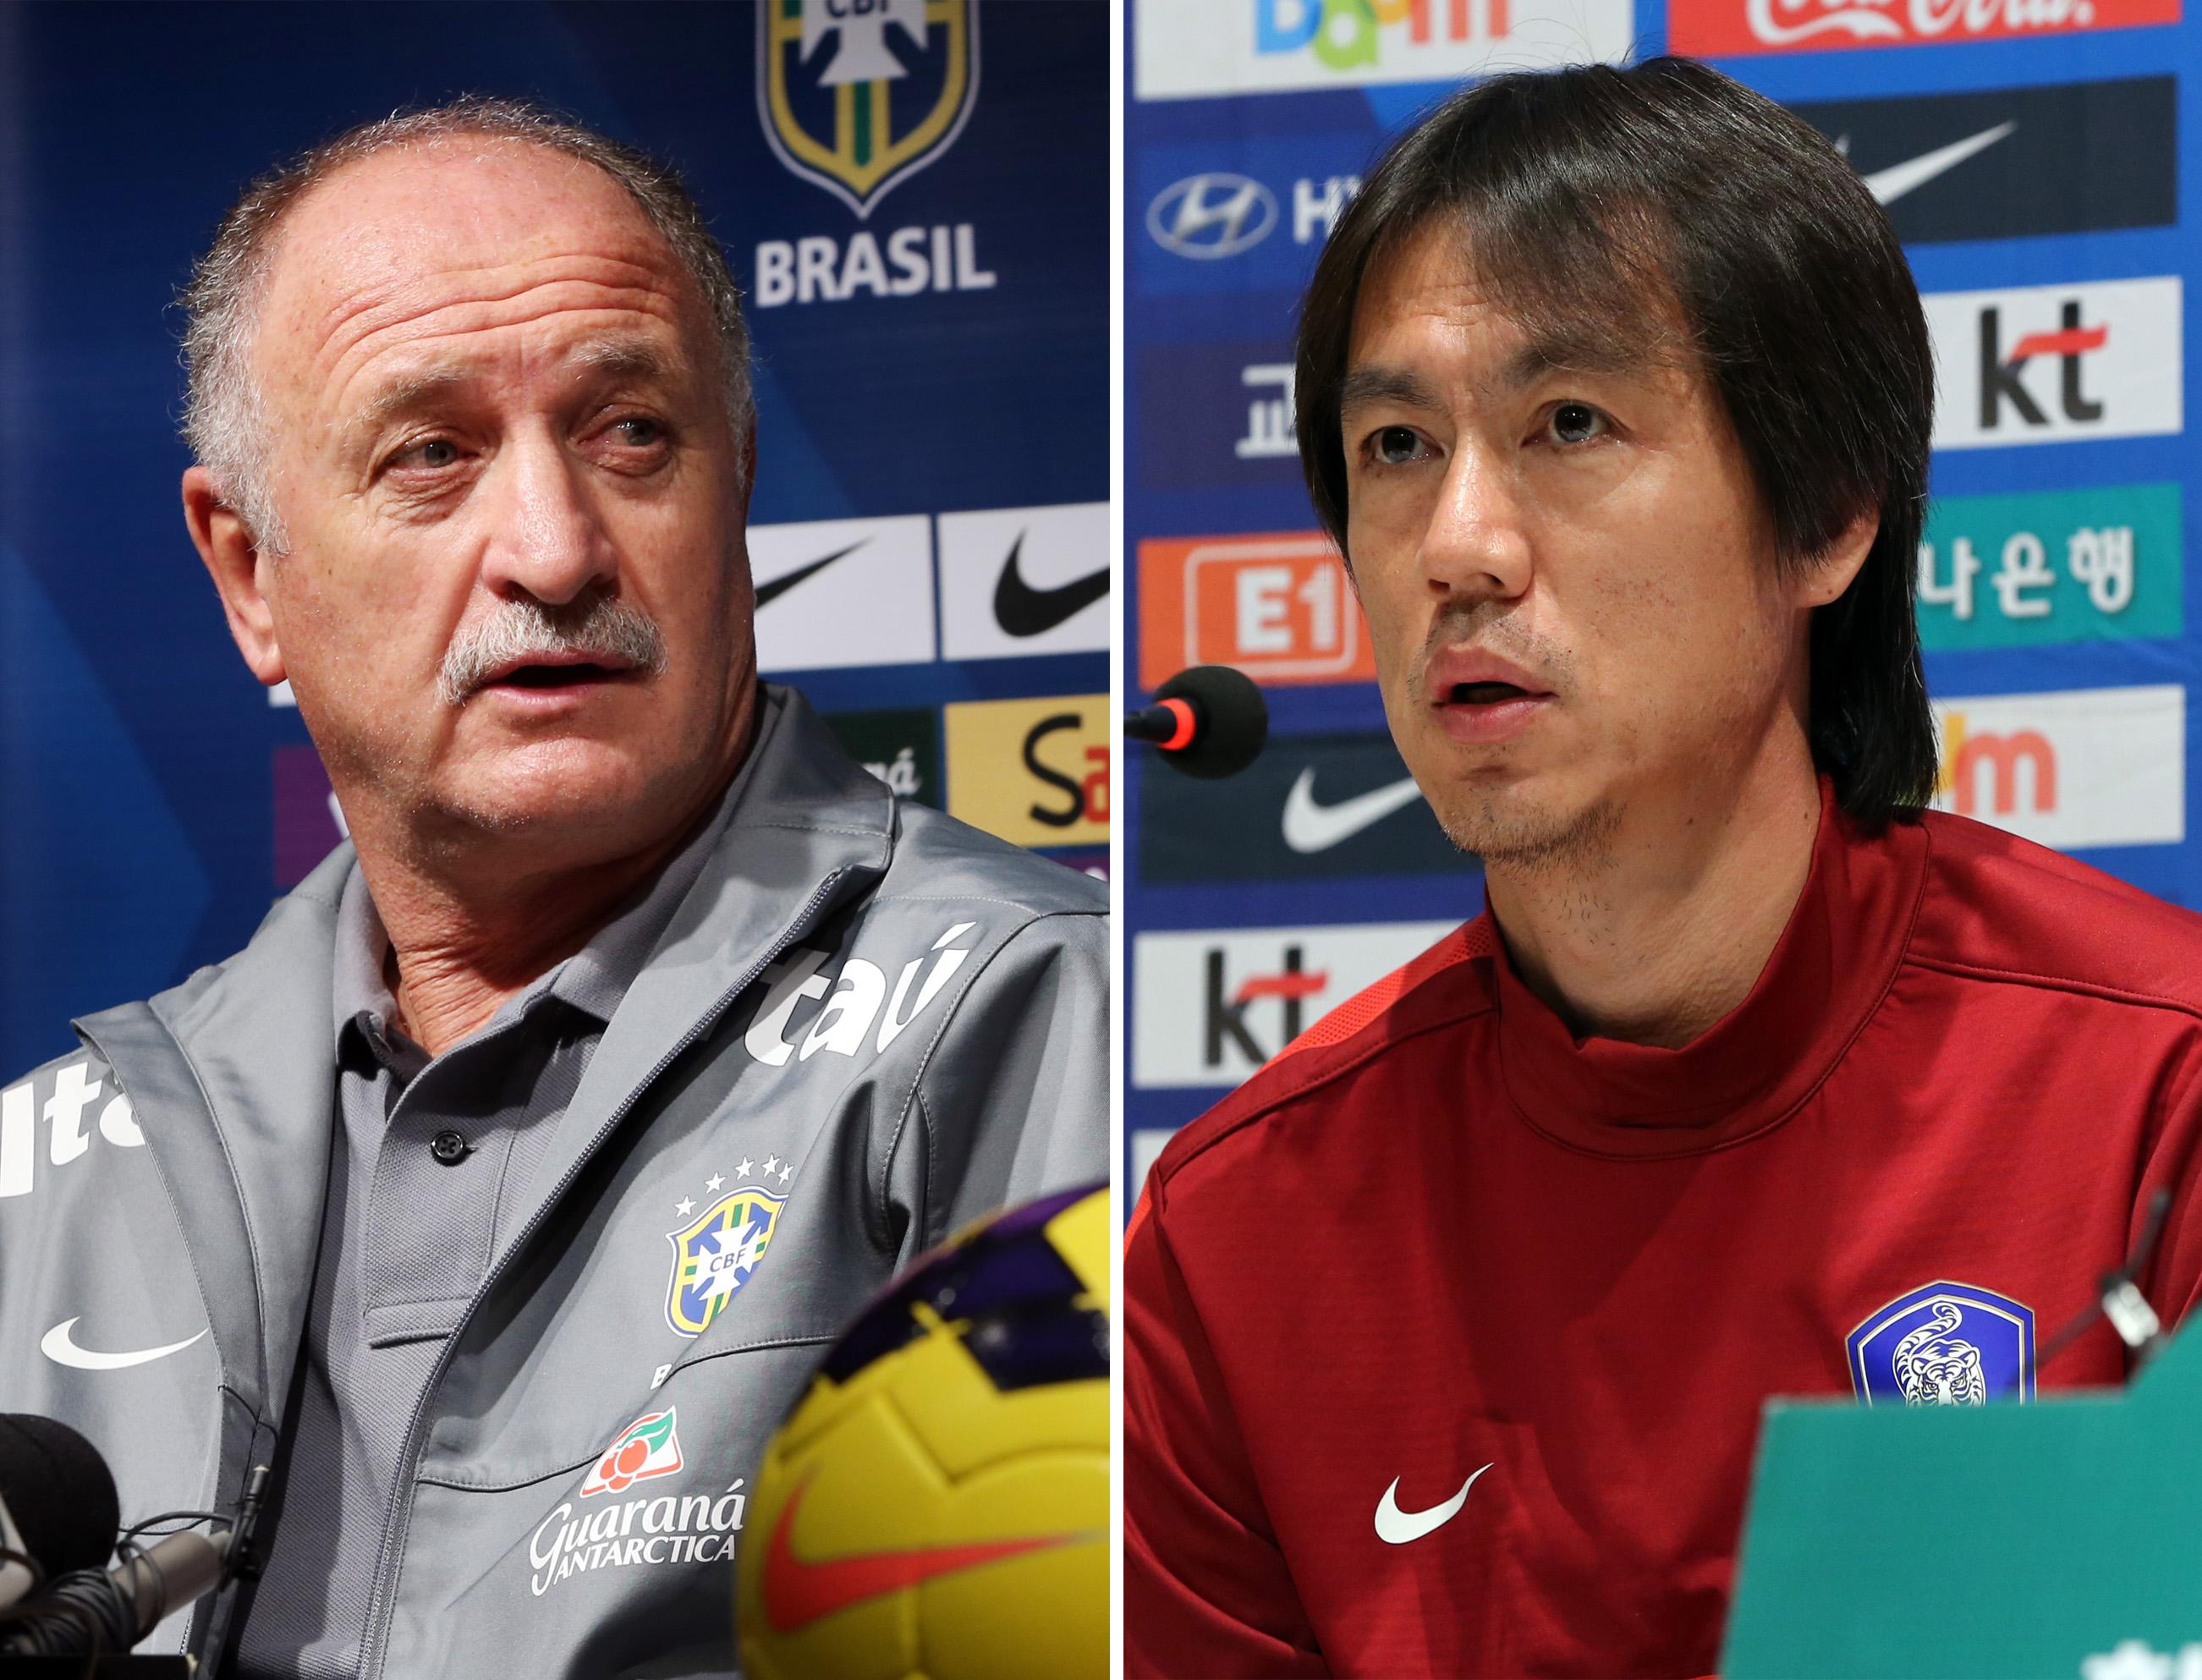 Brazil manager Luiz Felipe Scolari(left), and Korean skipper Hong Myung Bo will clash on Saturday night in Korea. (Yonhap)